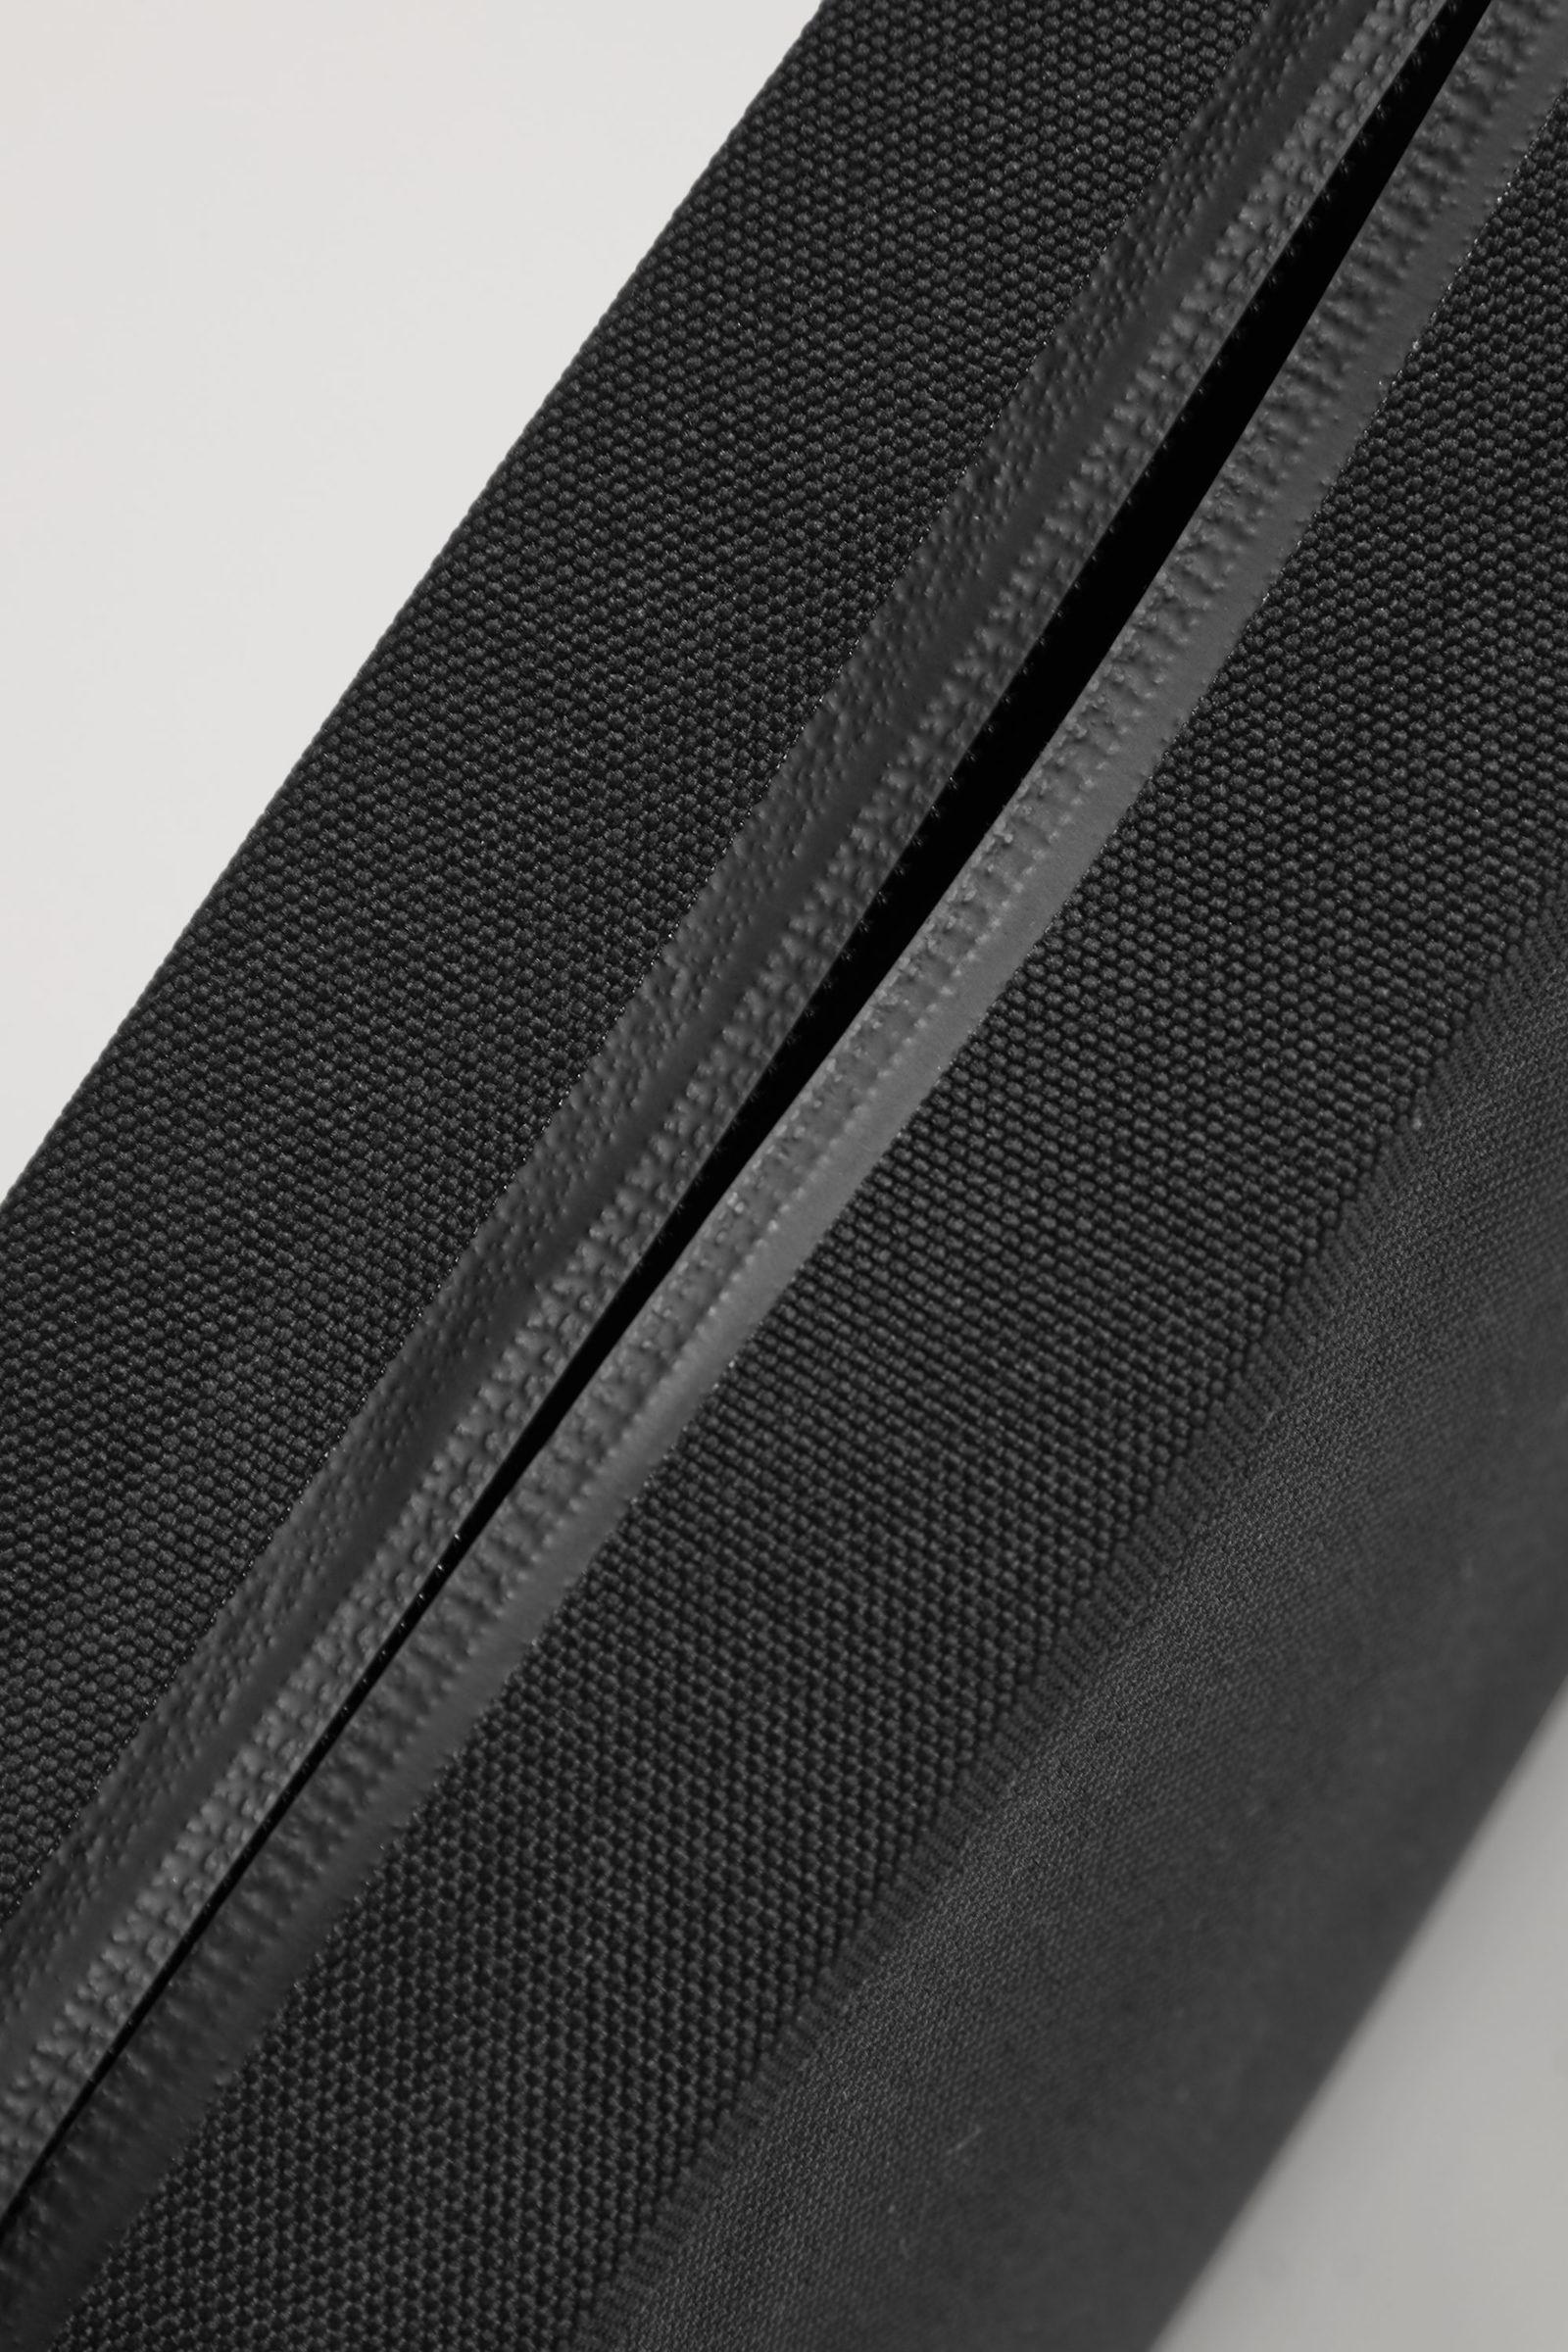 COS 리사이클드 폴리에스터 스트럭처드 크로스바디 백의 블랙컬러 Detail입니다.